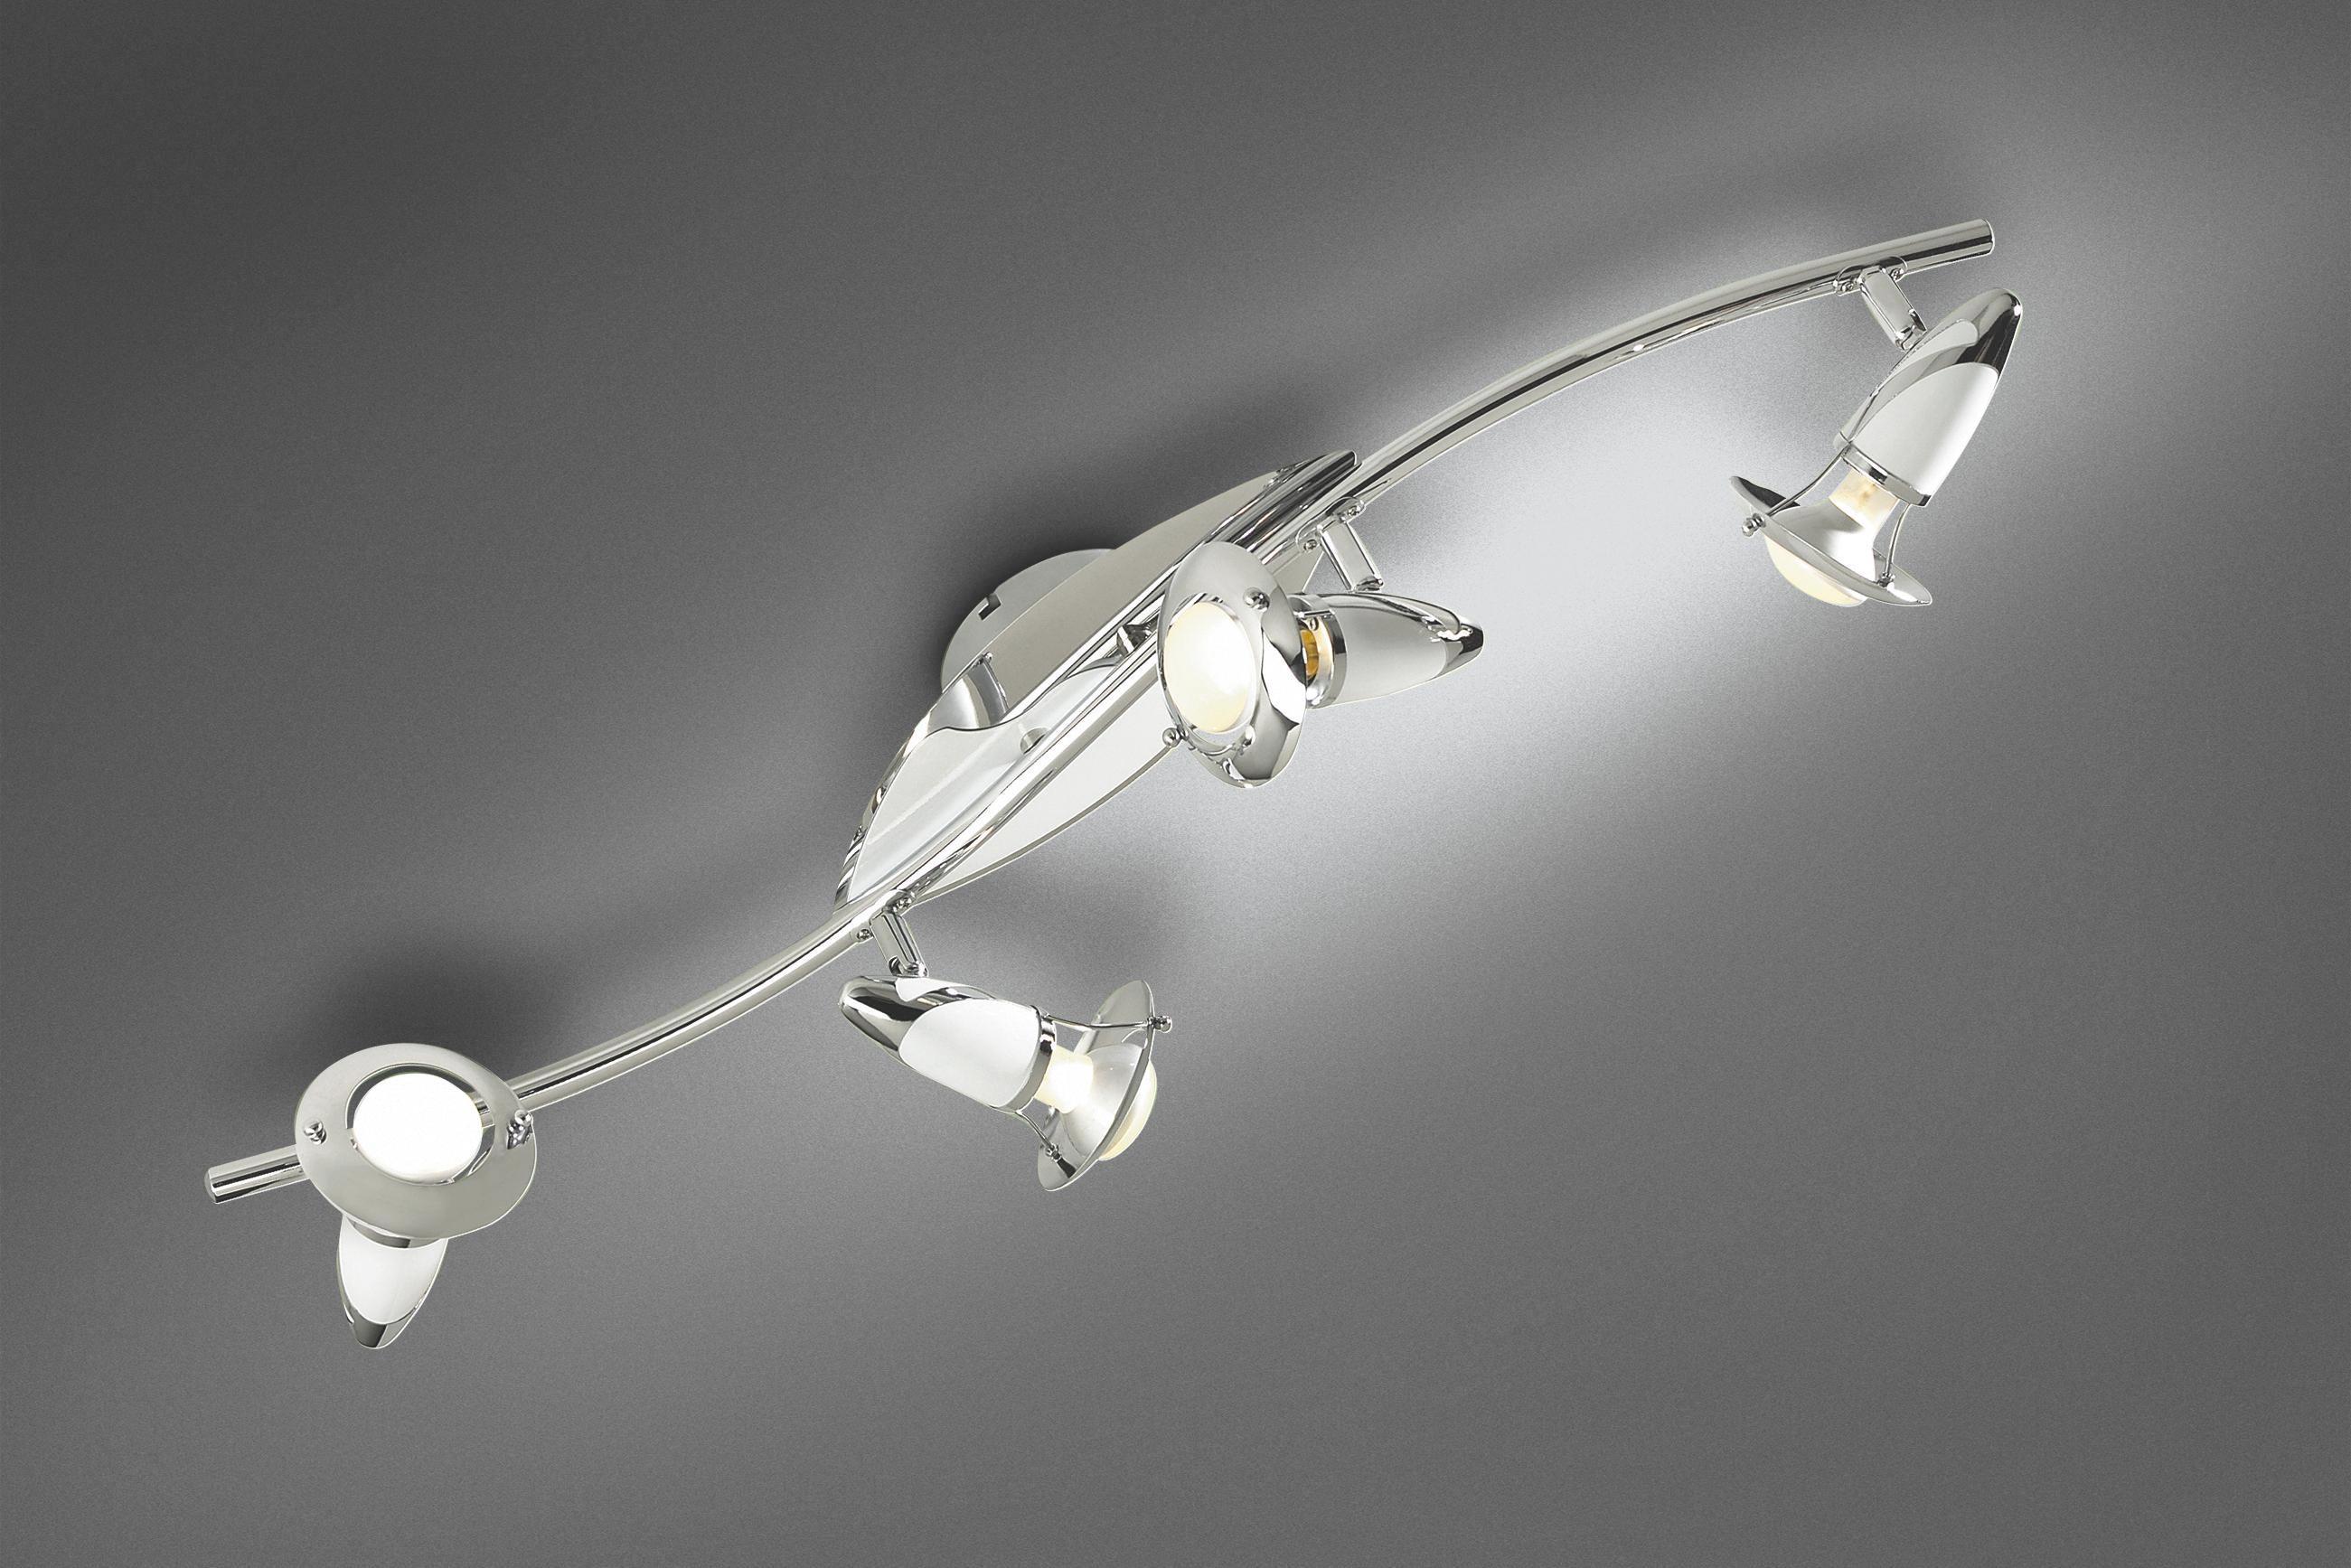 Reflektor Lord - bela/krom, Trendi, kovina (84cm) - MÖMAX modern living